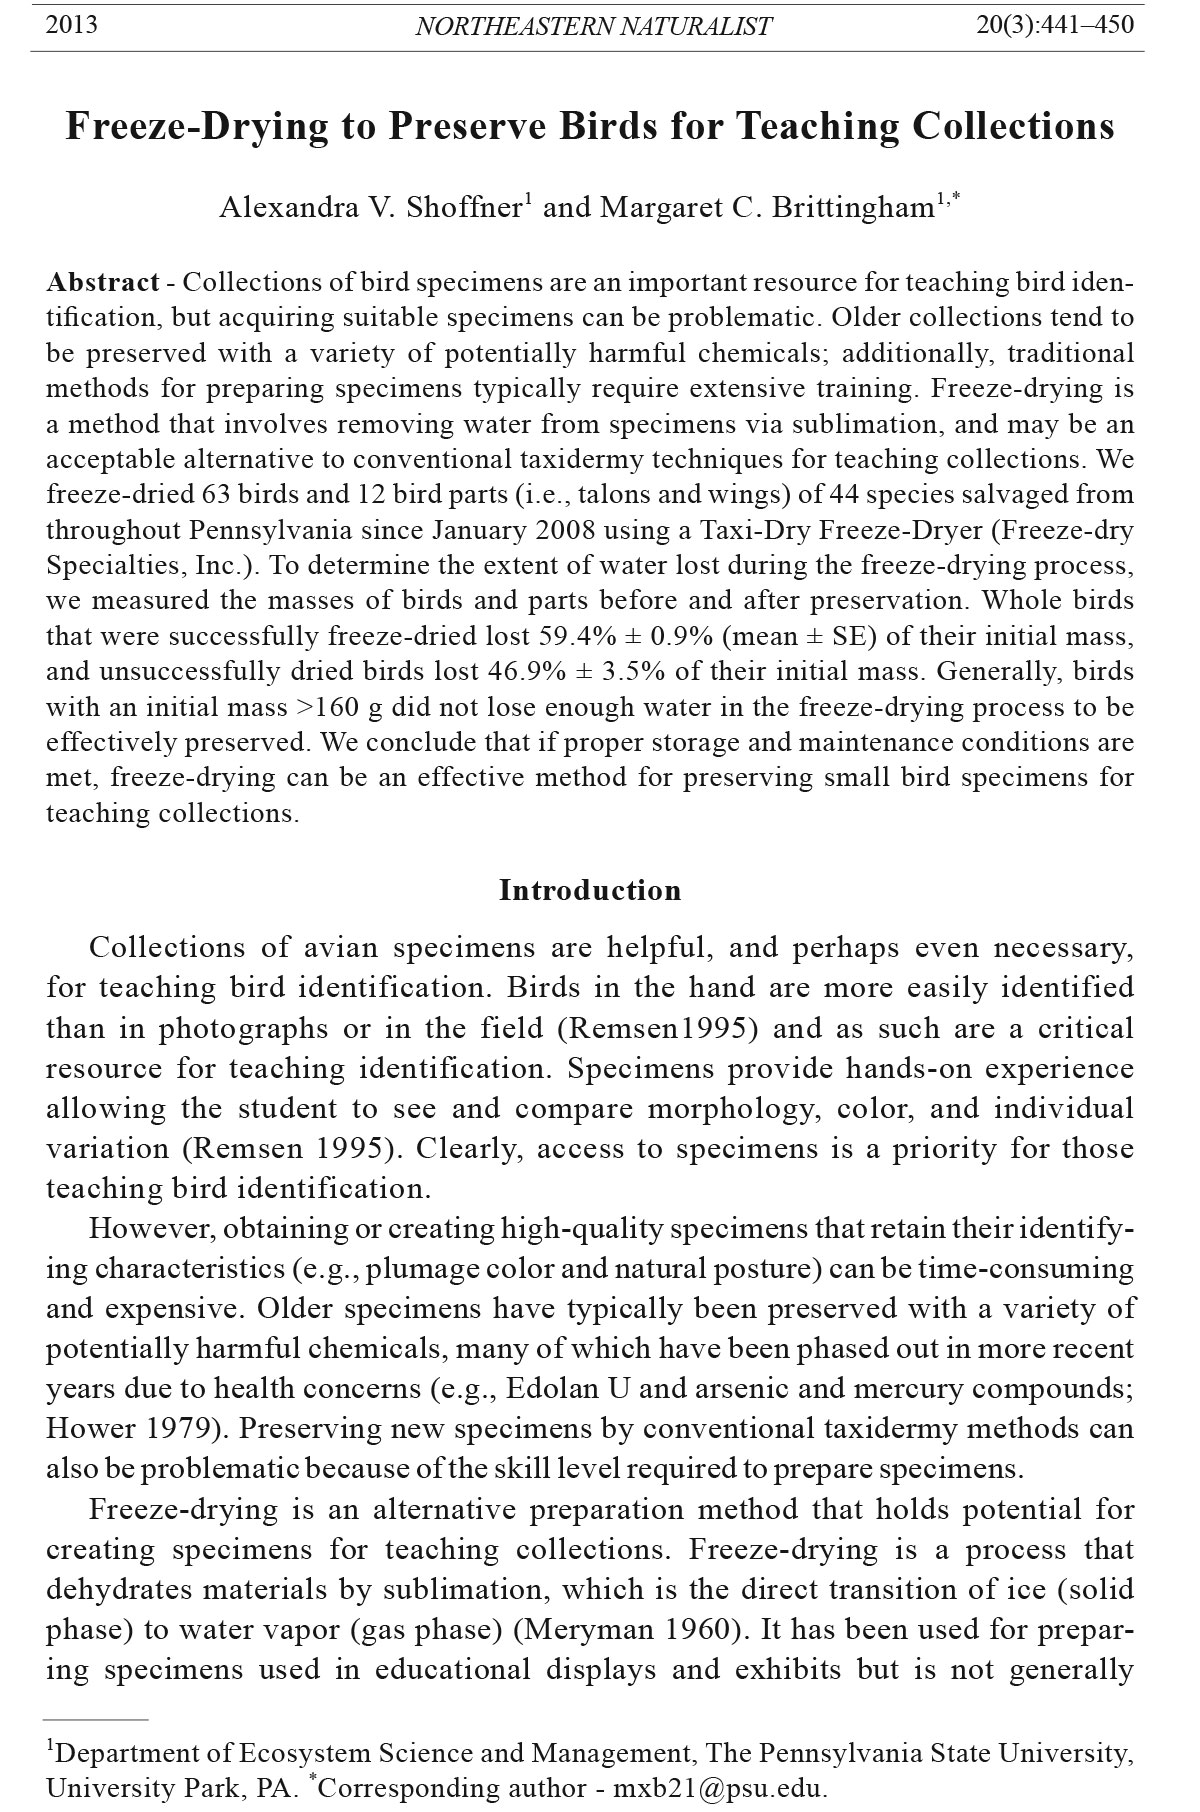 Northeastern Naturalist, Volume 20, Number 3 (2013): 441–450